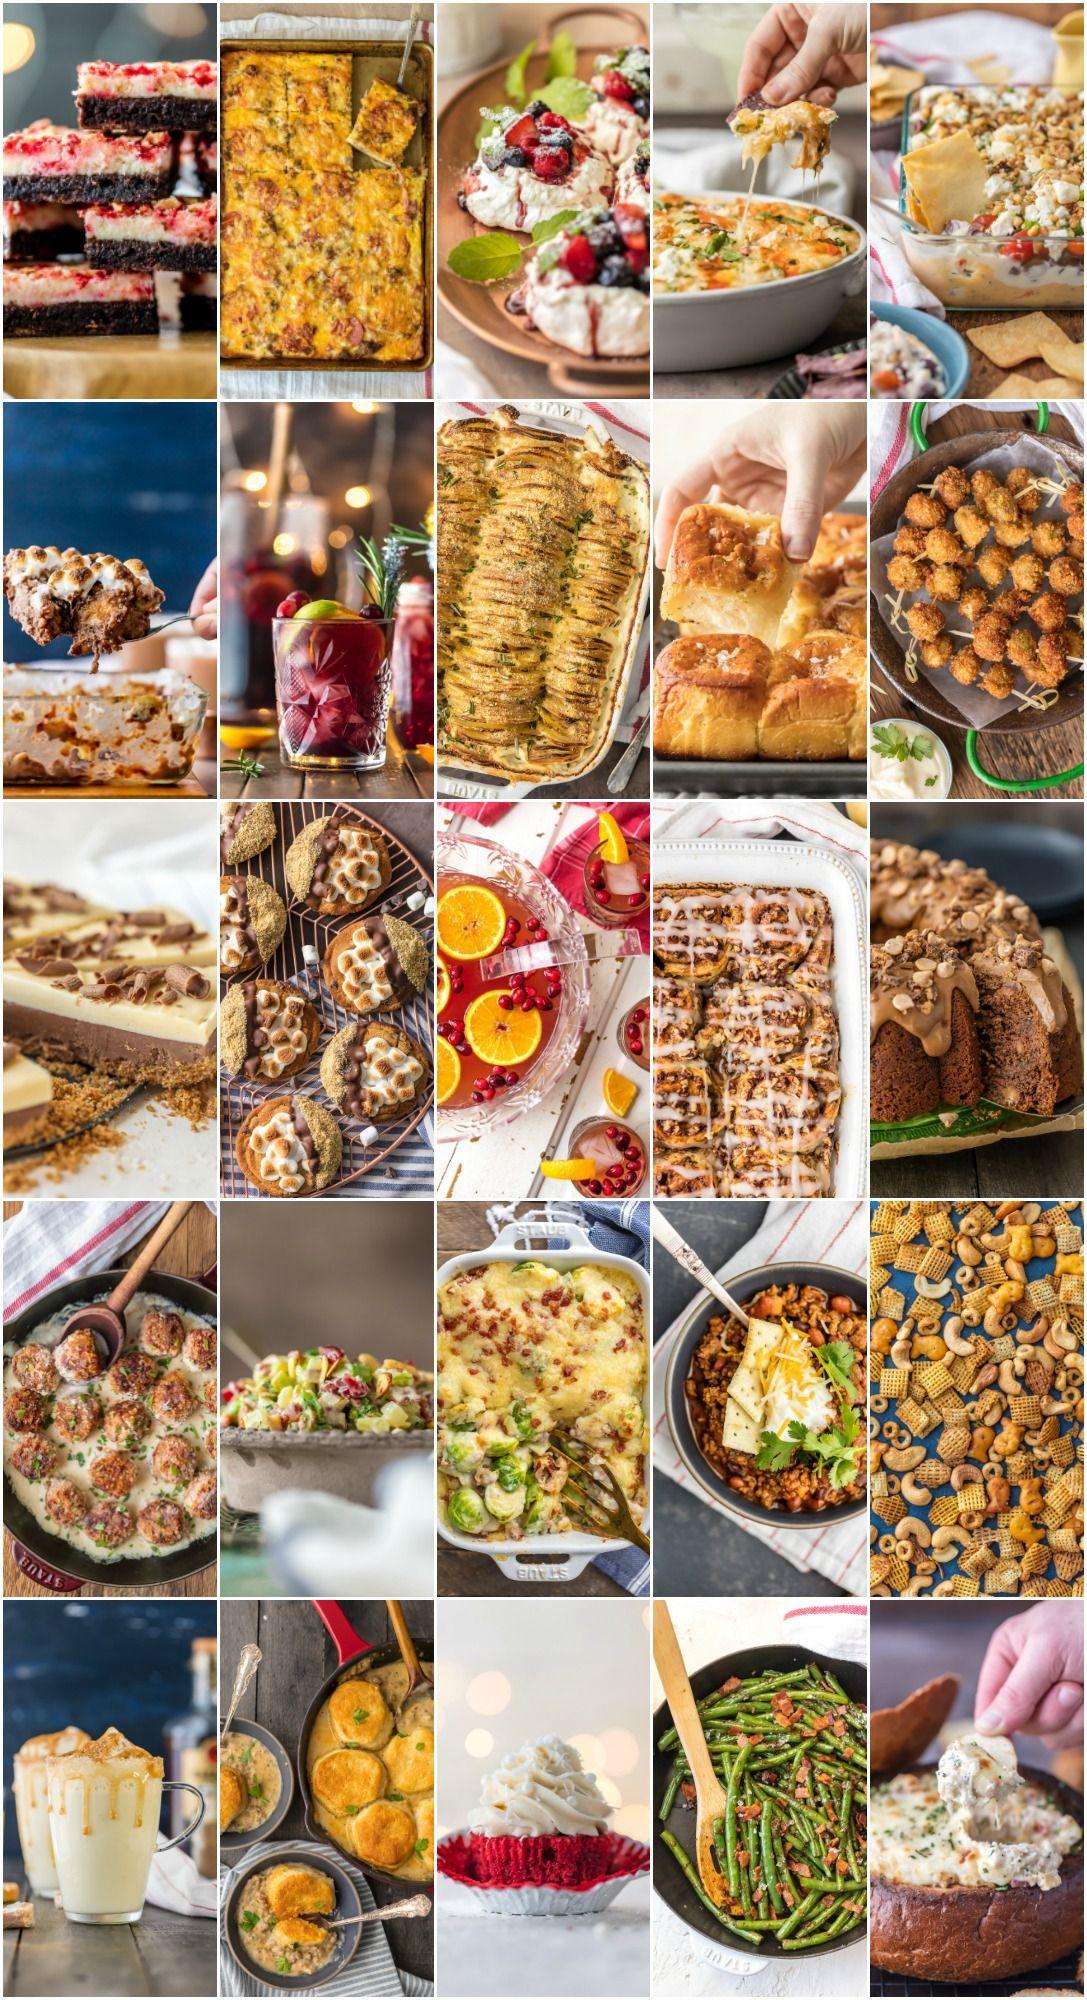 10 Last Minute Christmas Recipes